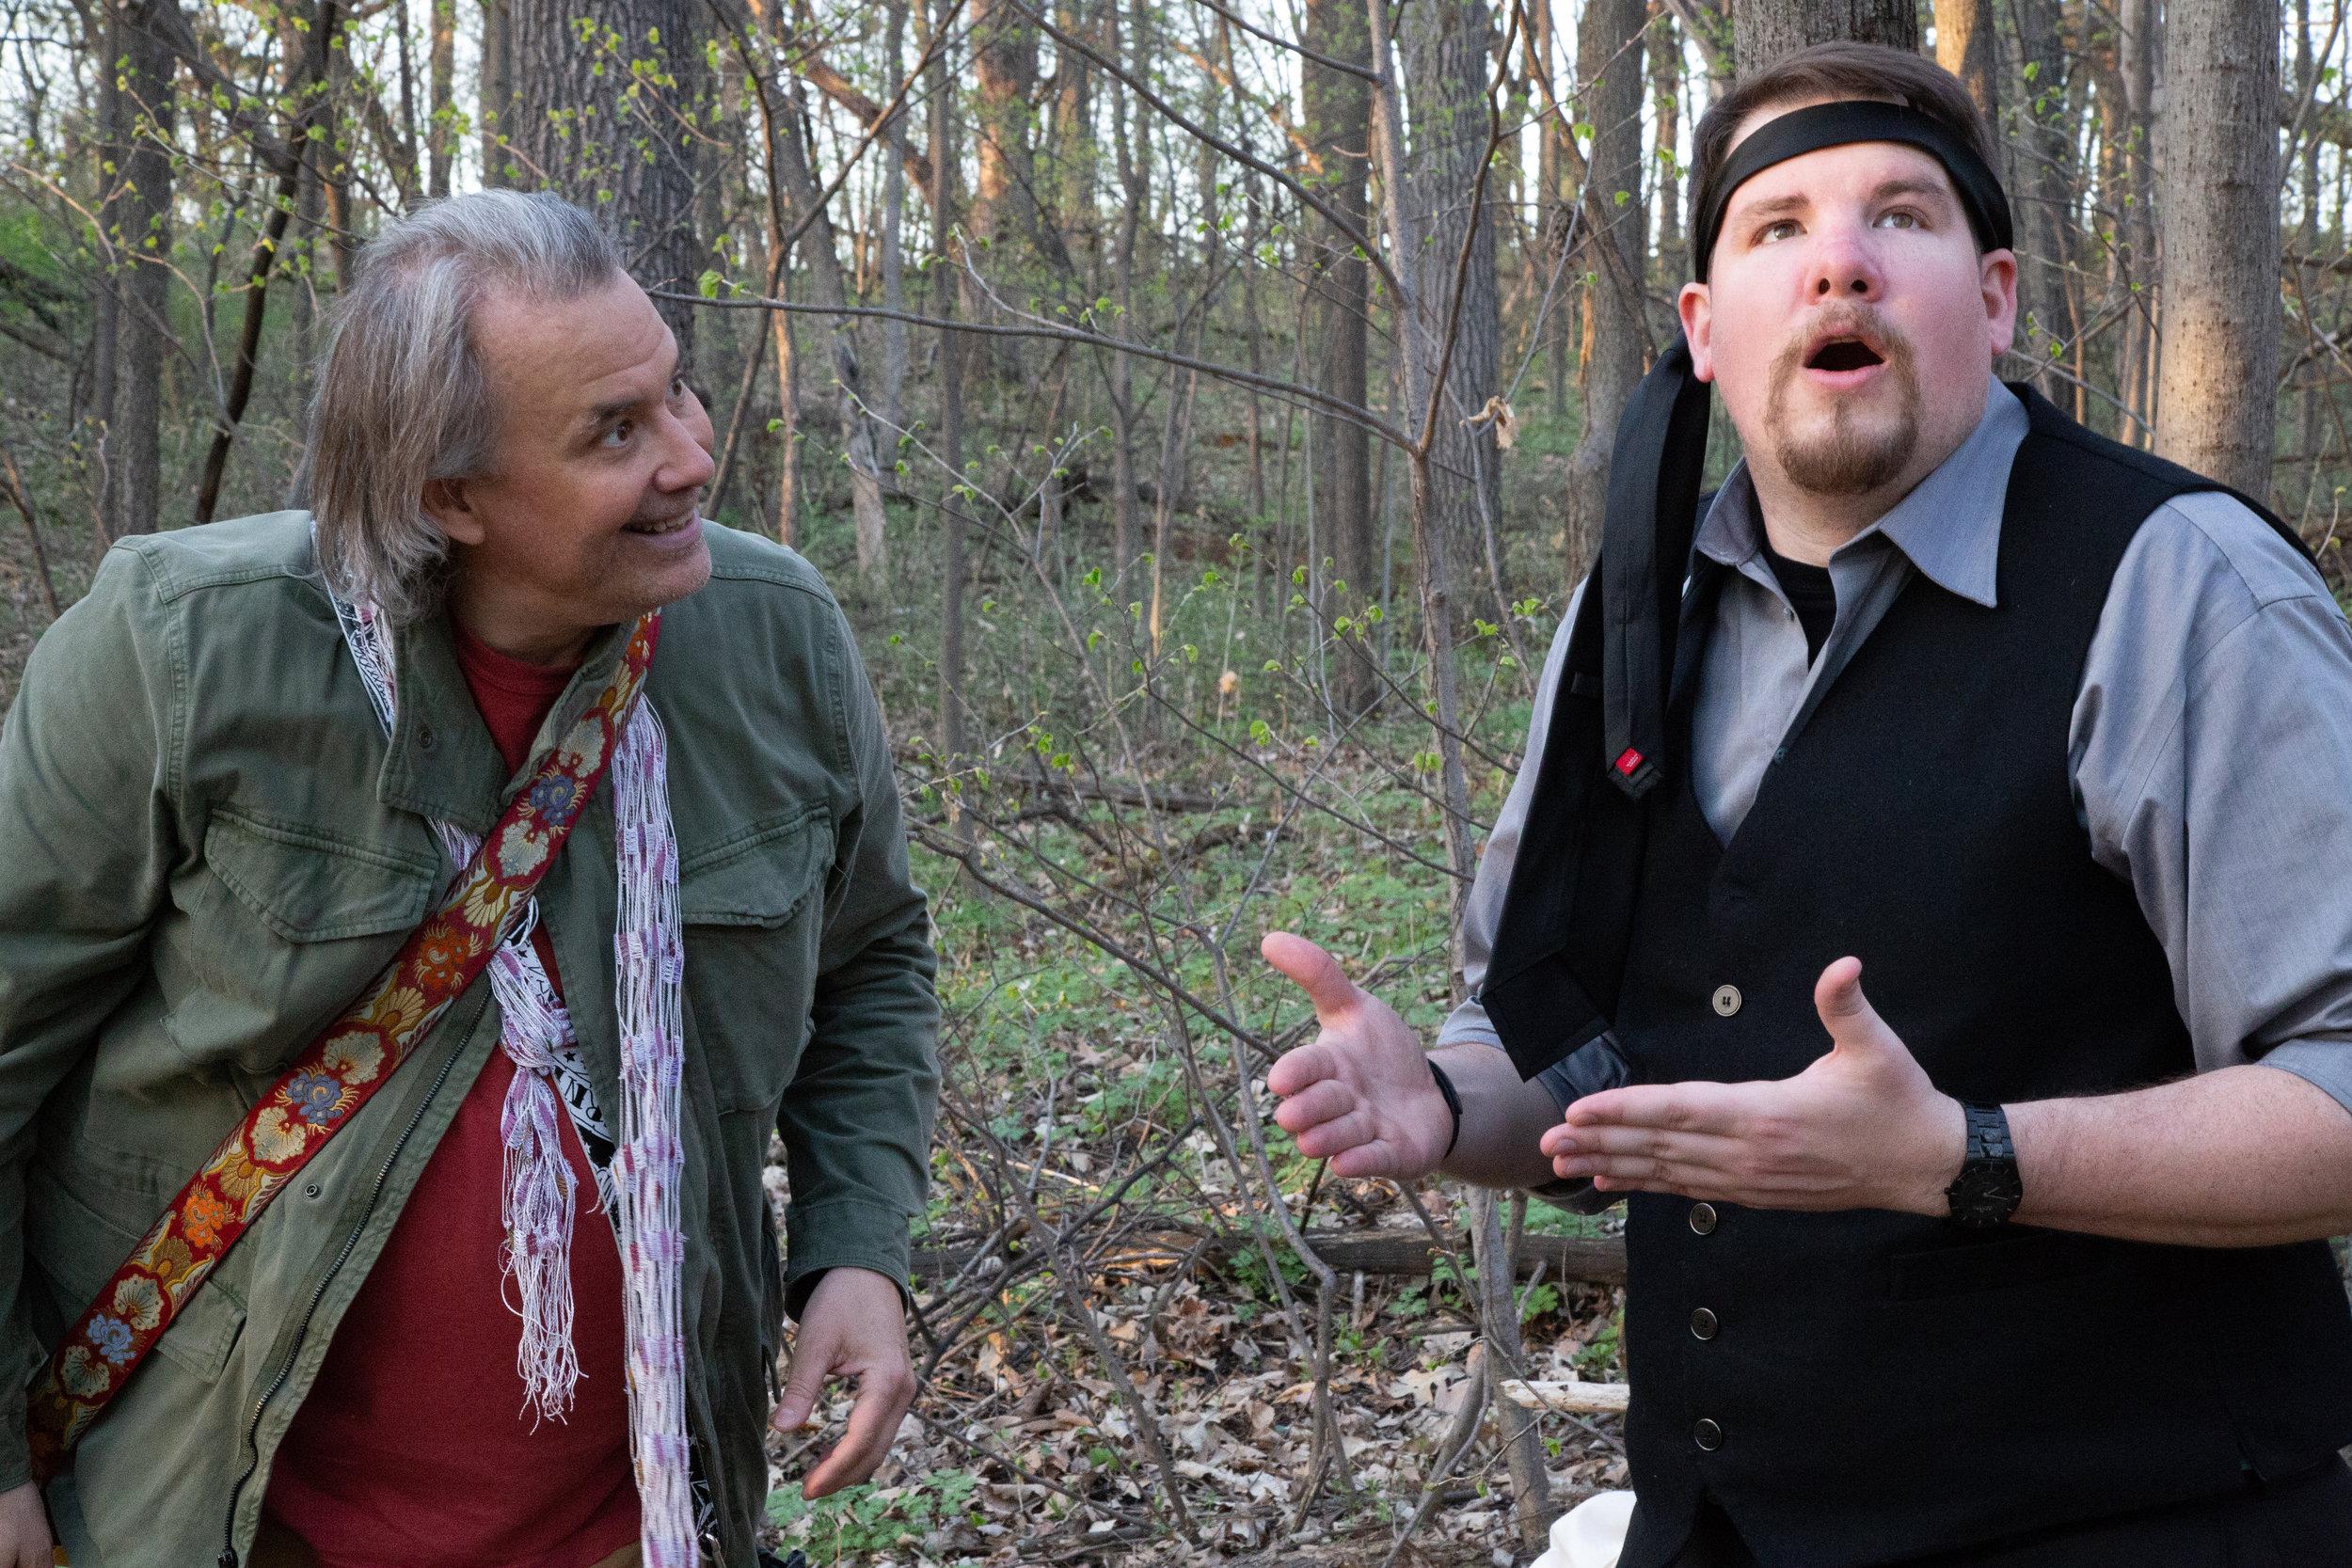 Feste (Rob Andersen) clowning around with Malvolio (Tom Sorenson)